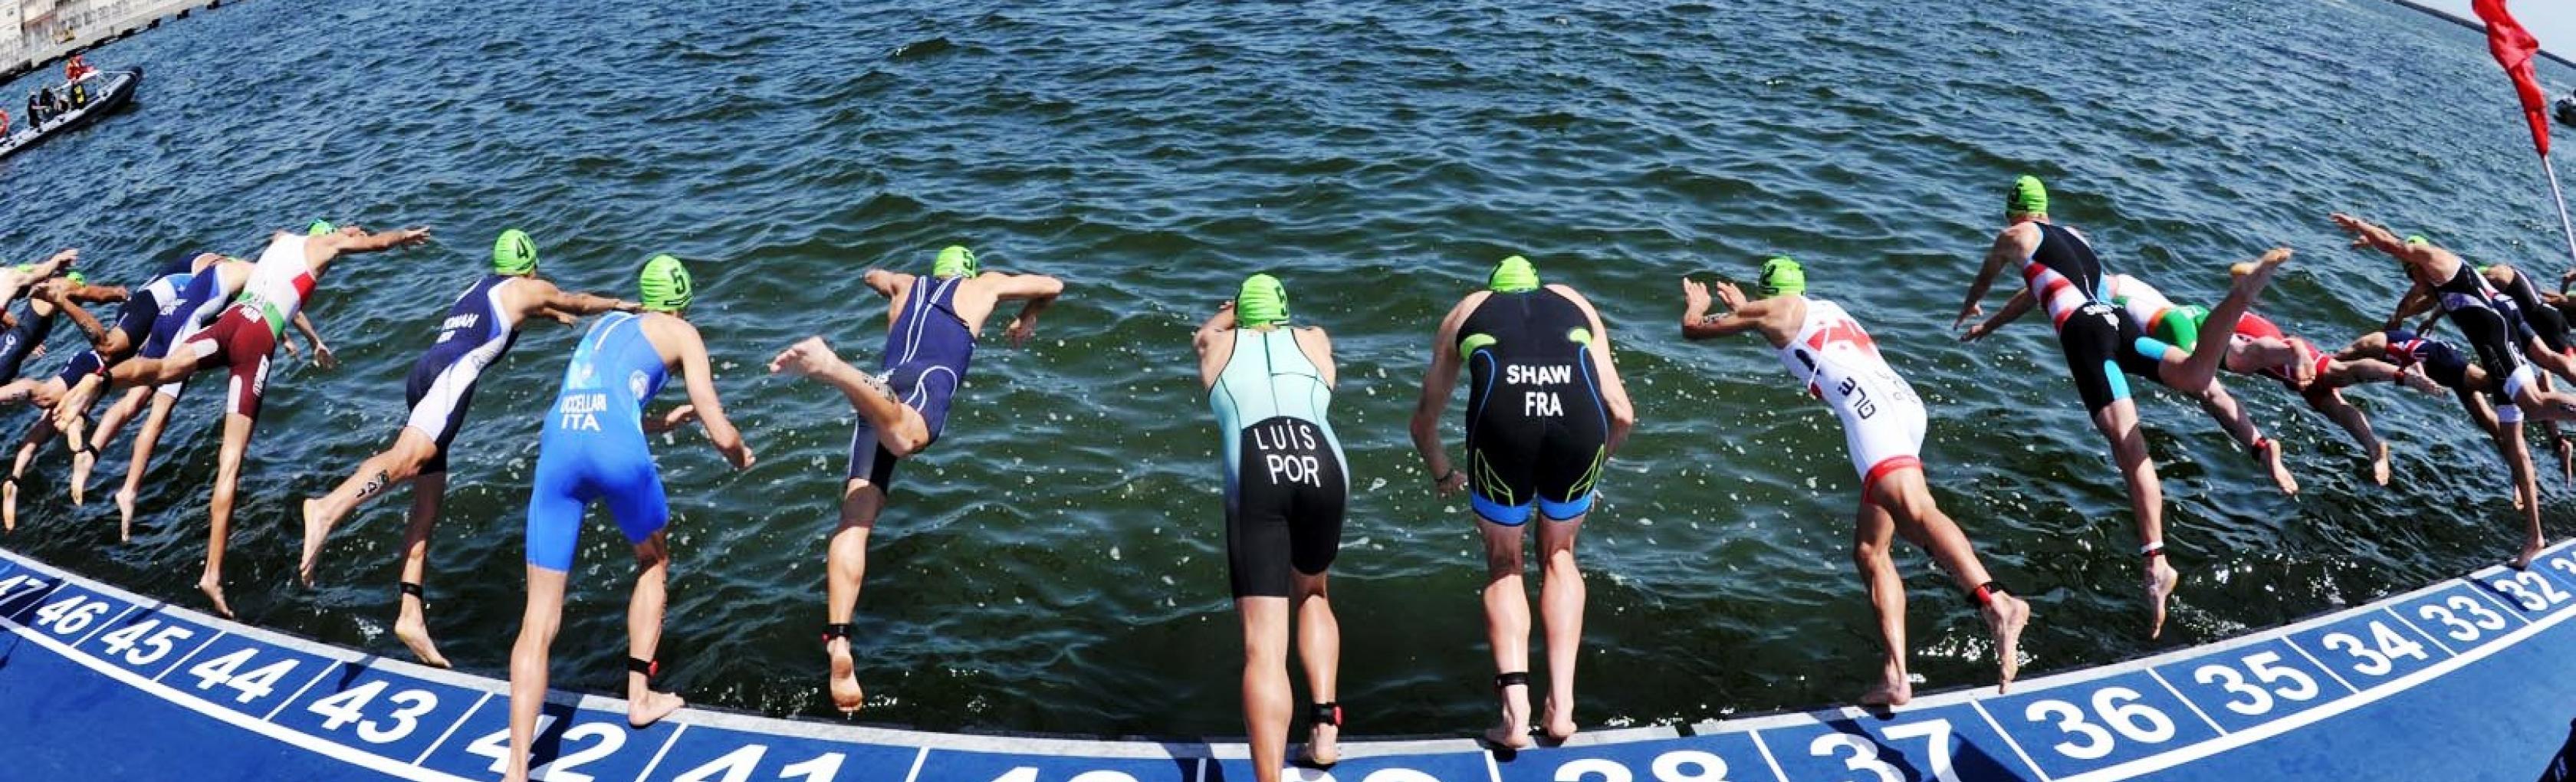 Itu World Cup_Cagliari-prova di nuoto